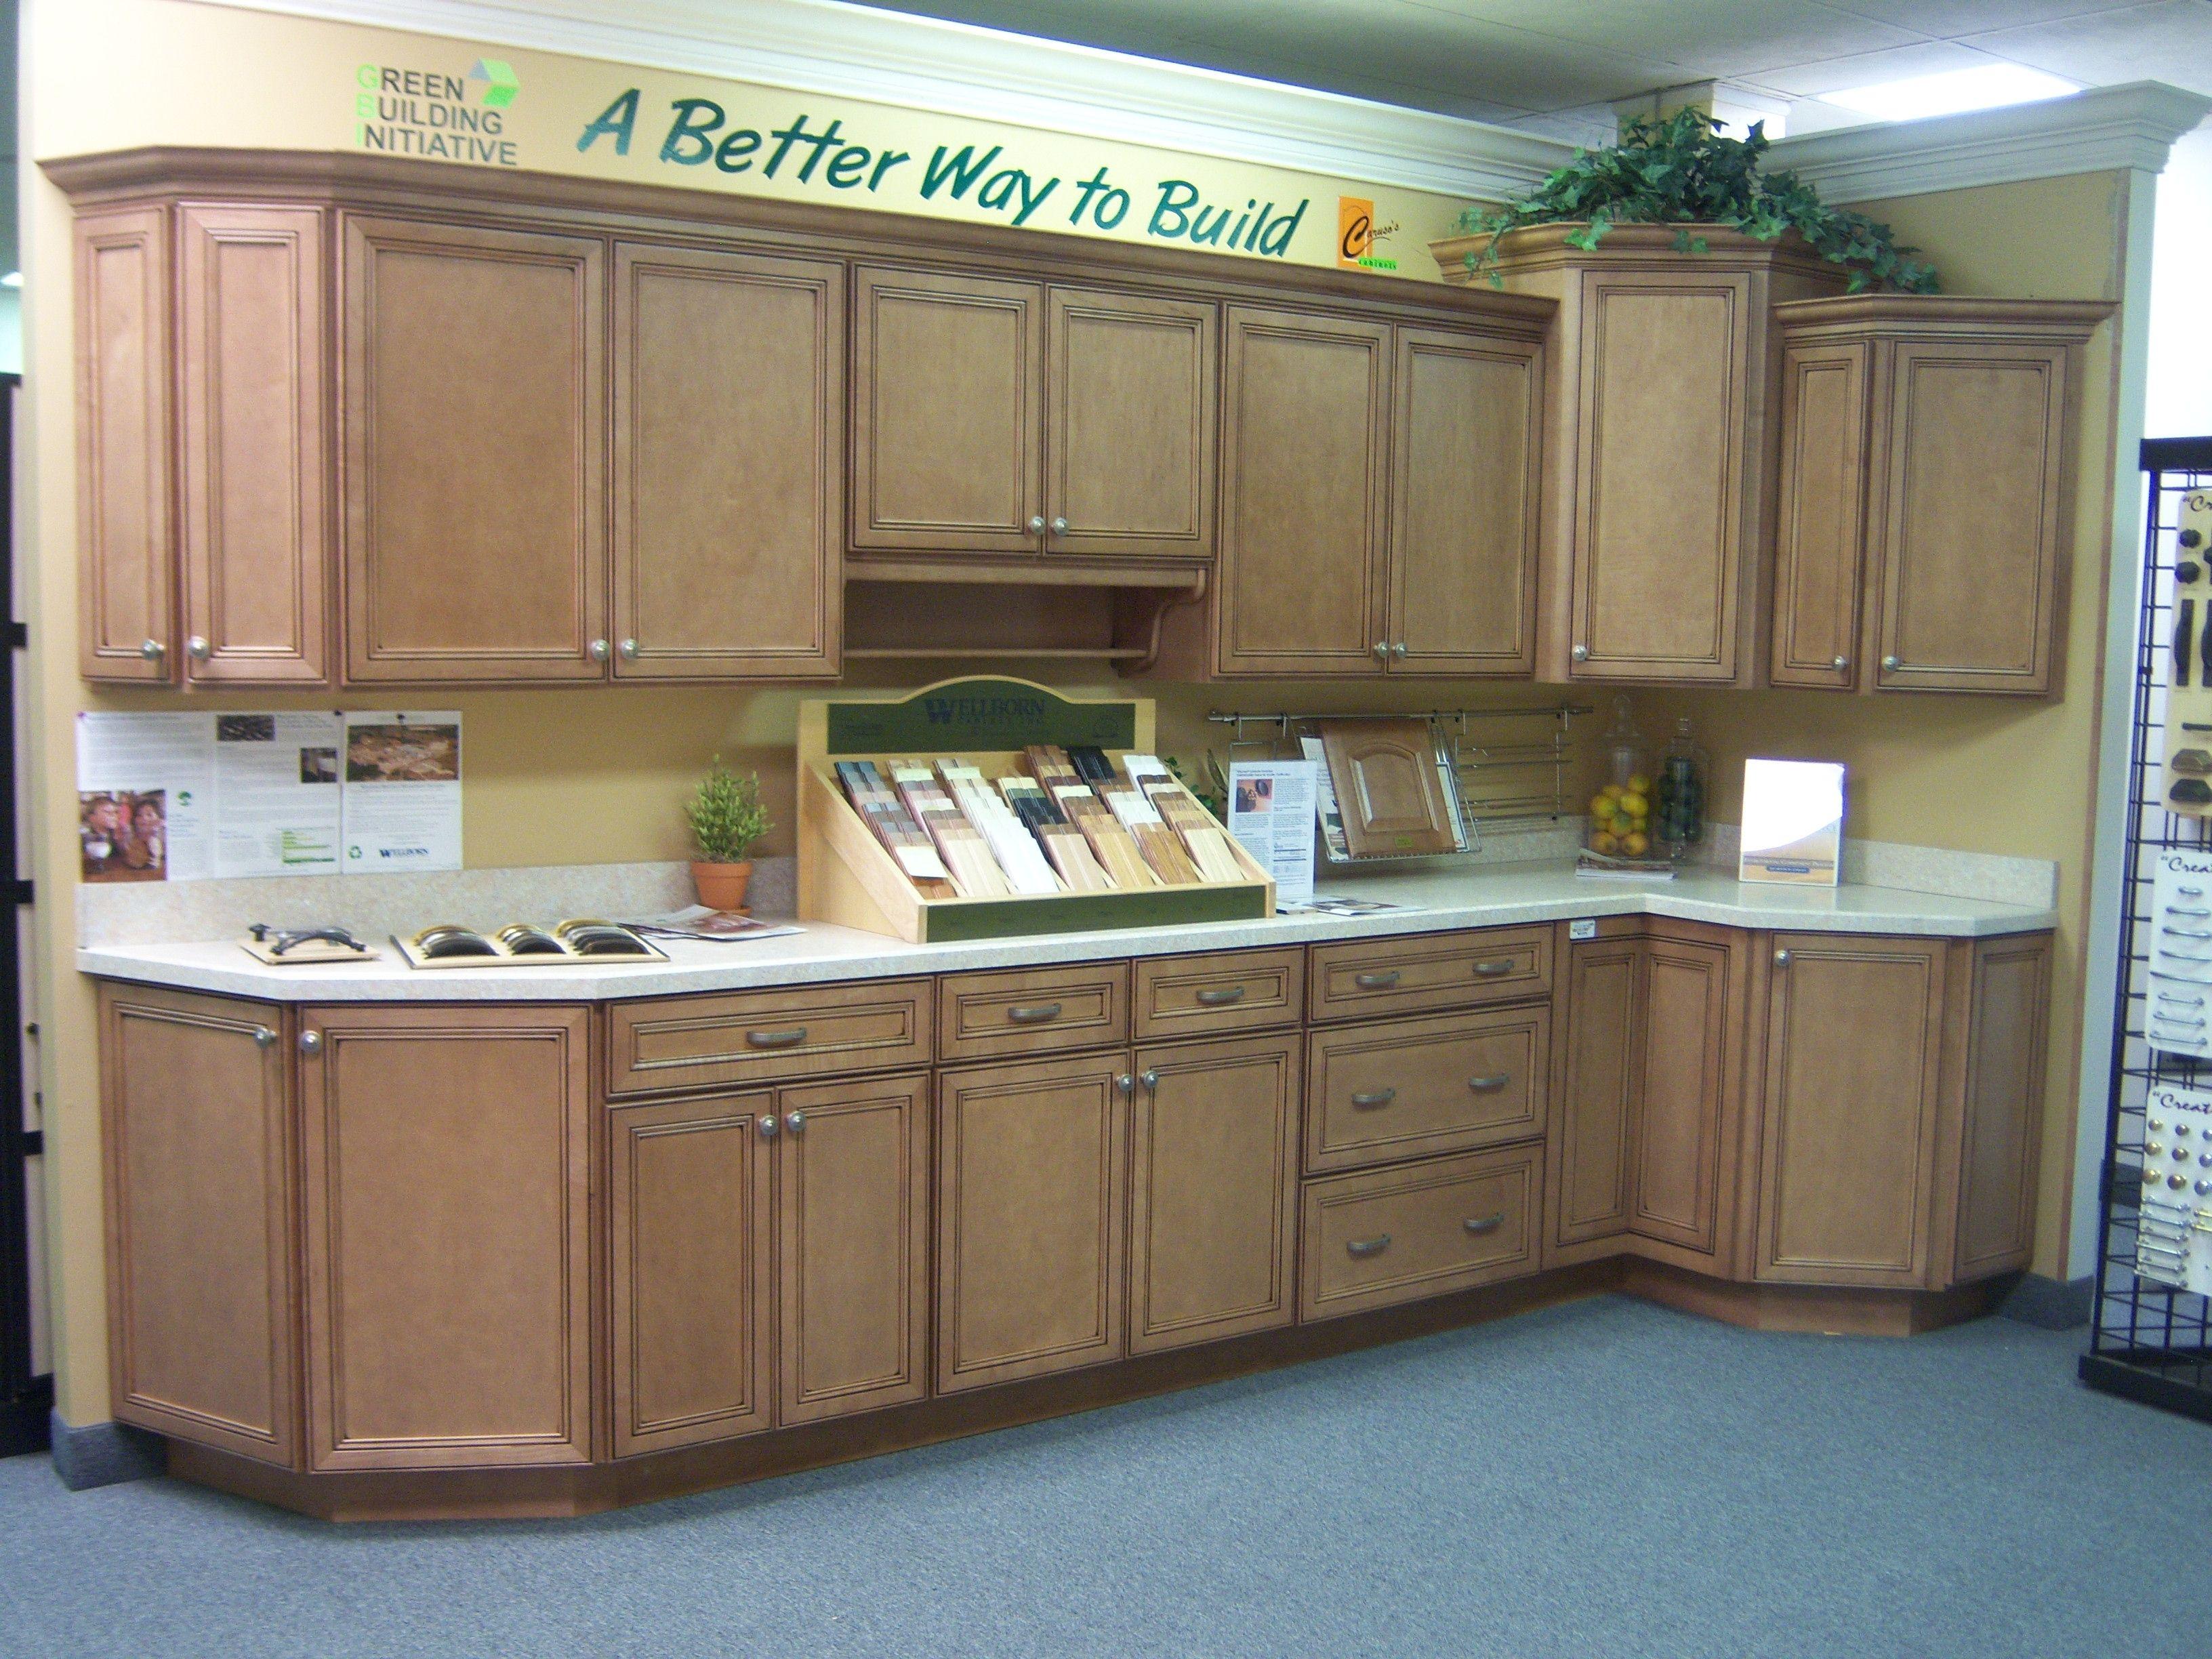 Caruso S Cabinets Harmony Maple Nutmeg Java Wellborncabinet Wellborn Cabinets Cabinet Kitchen Cabinets